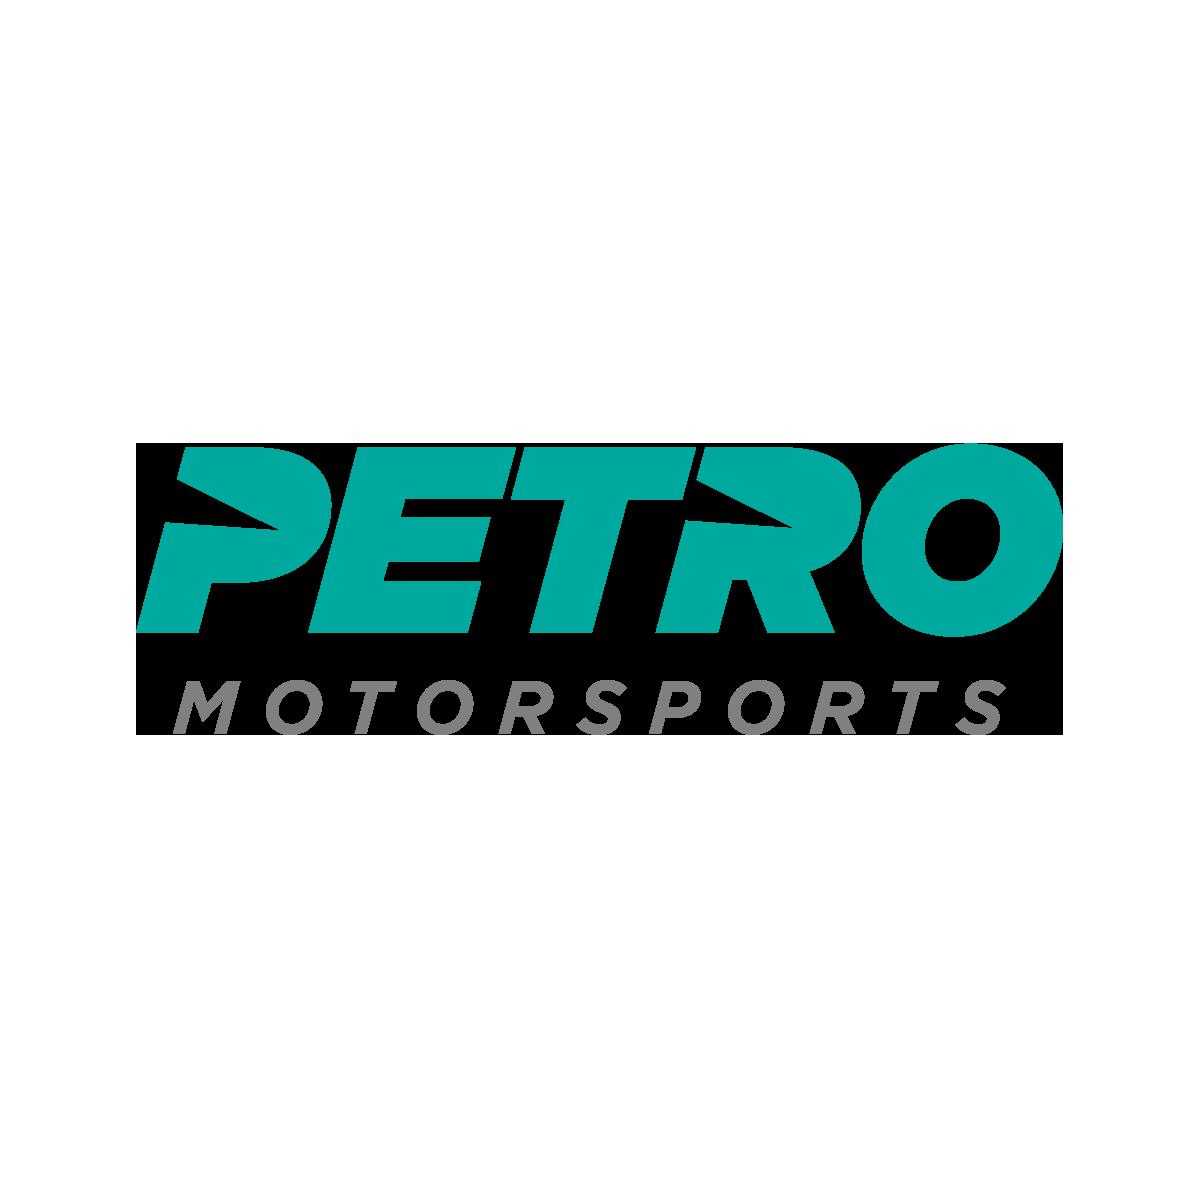 Petro Motorsports